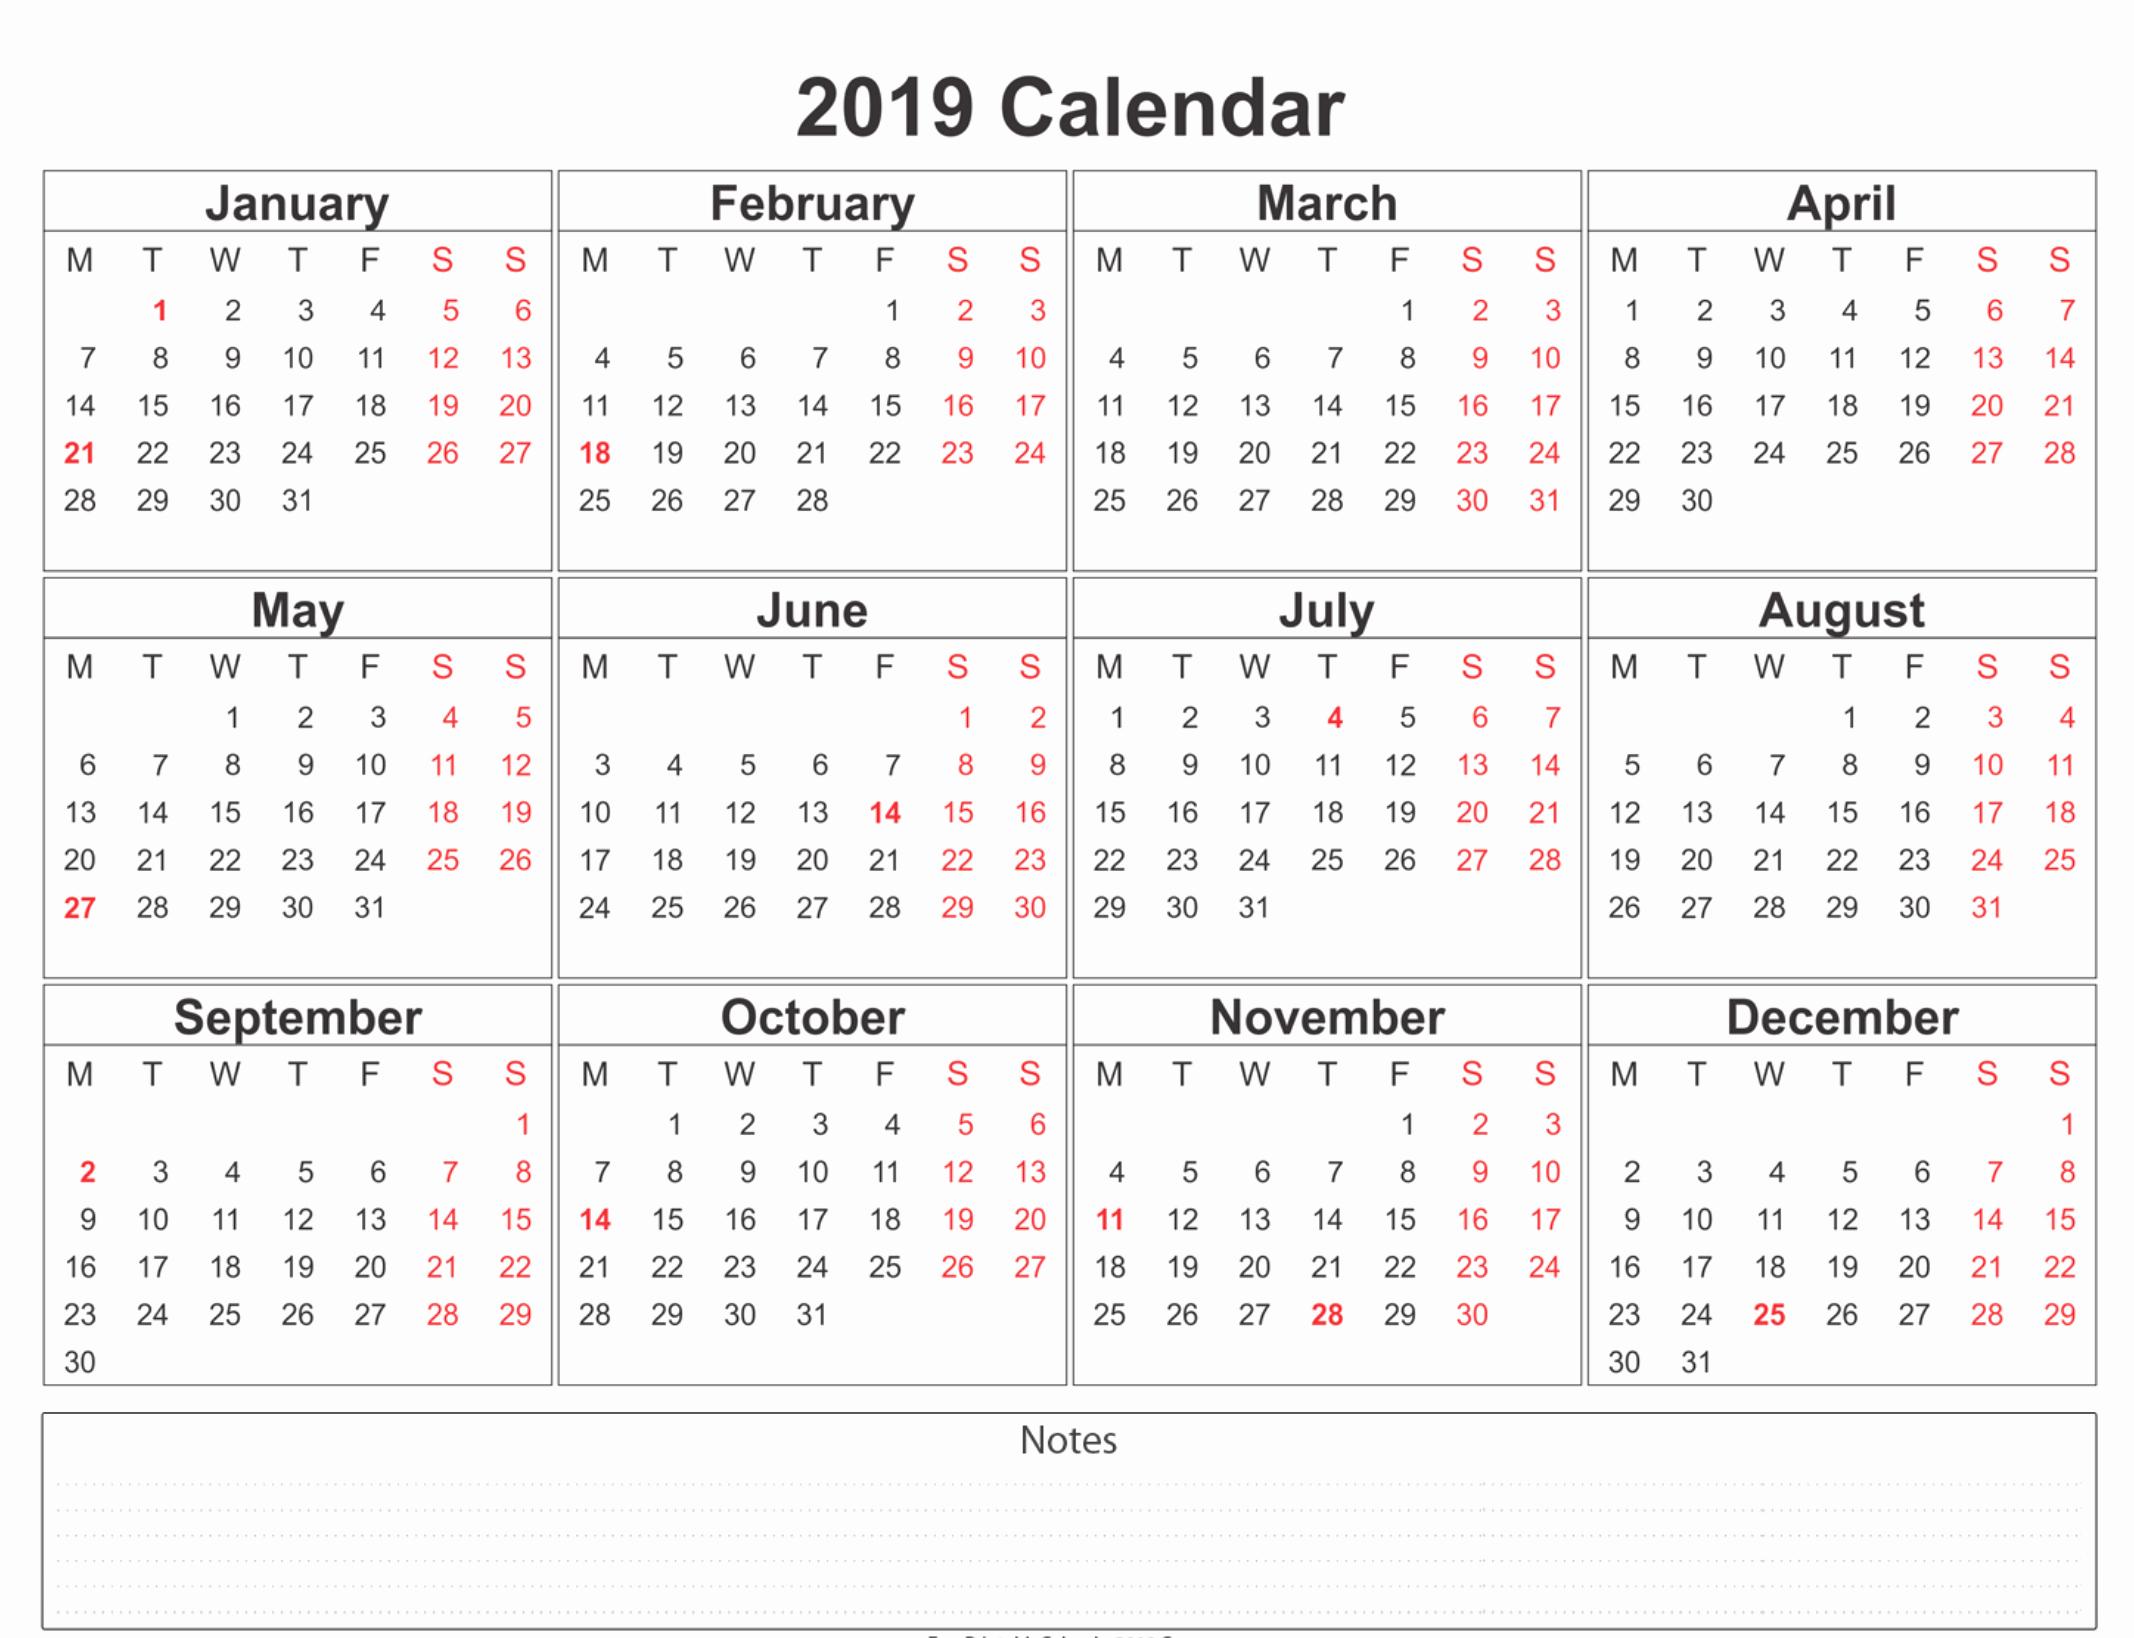 Free Printable Weekly Calendar 2019 New 2019 Calendar Amazonaws